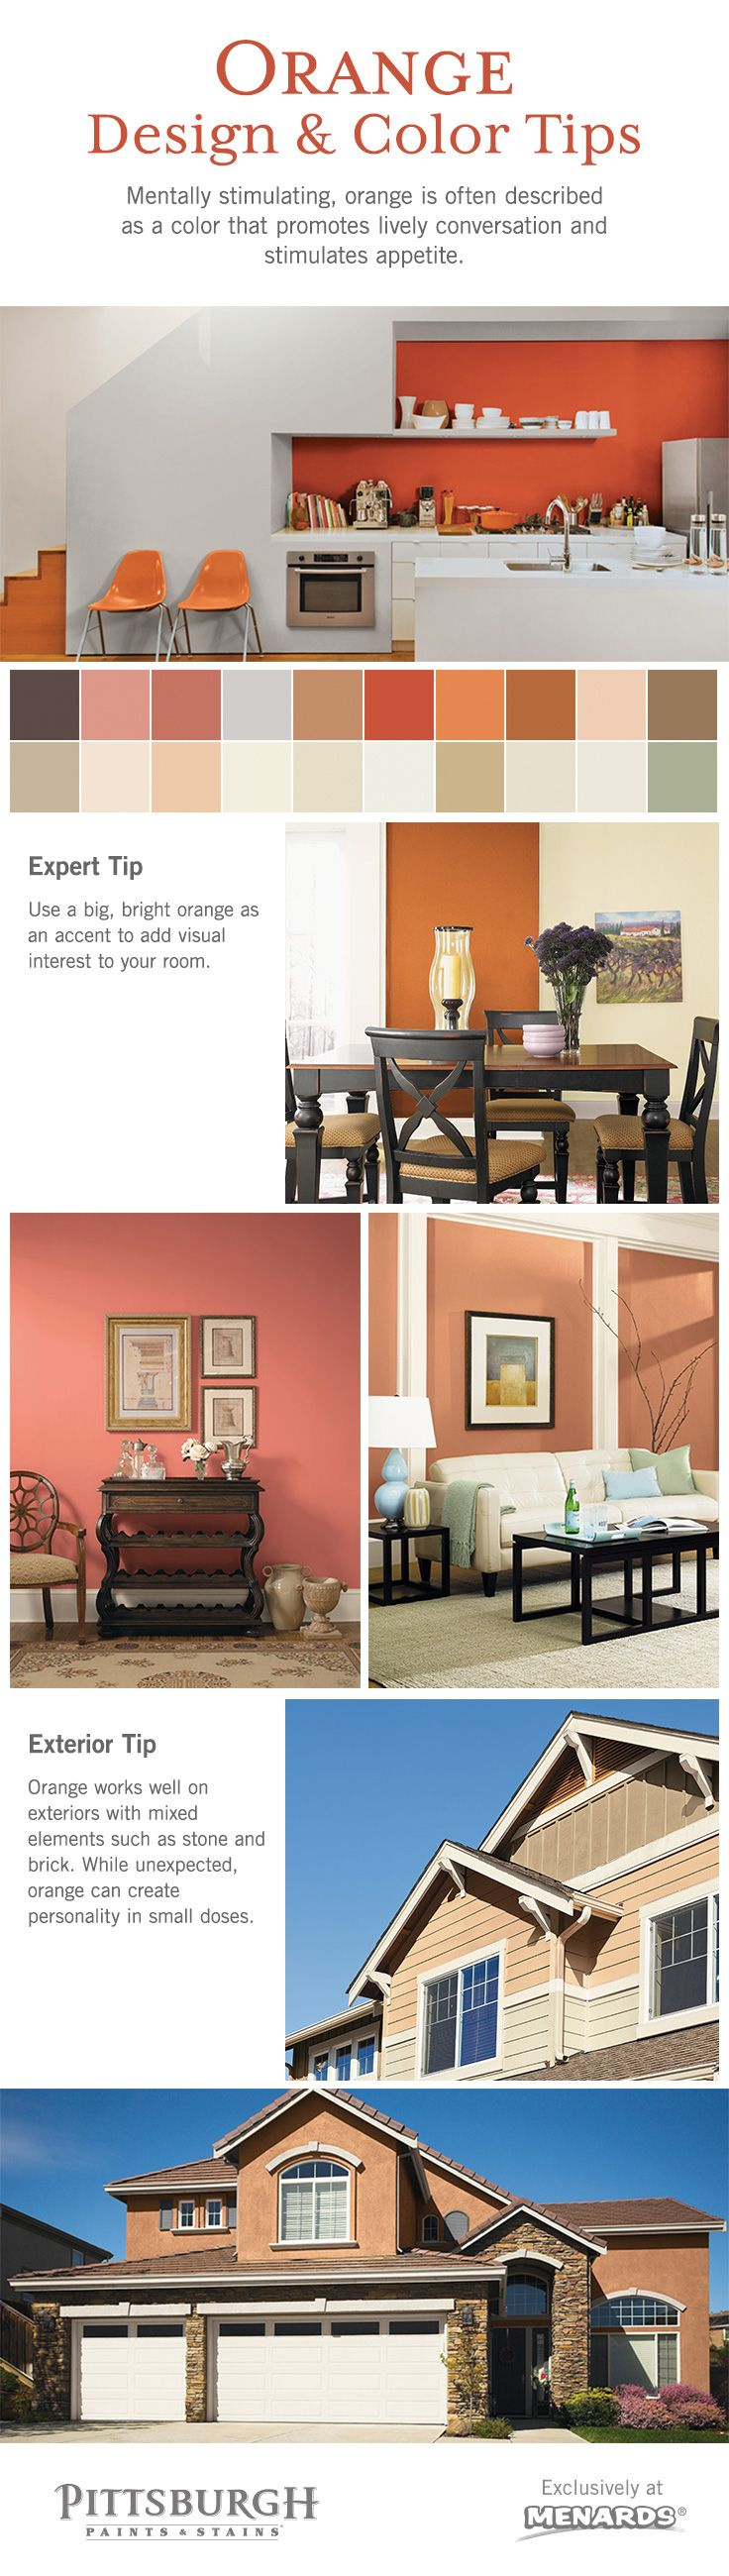 24 Best Images About Our Best Orange Paint Color Tips On Pinterest Apple Cider Latex Formula